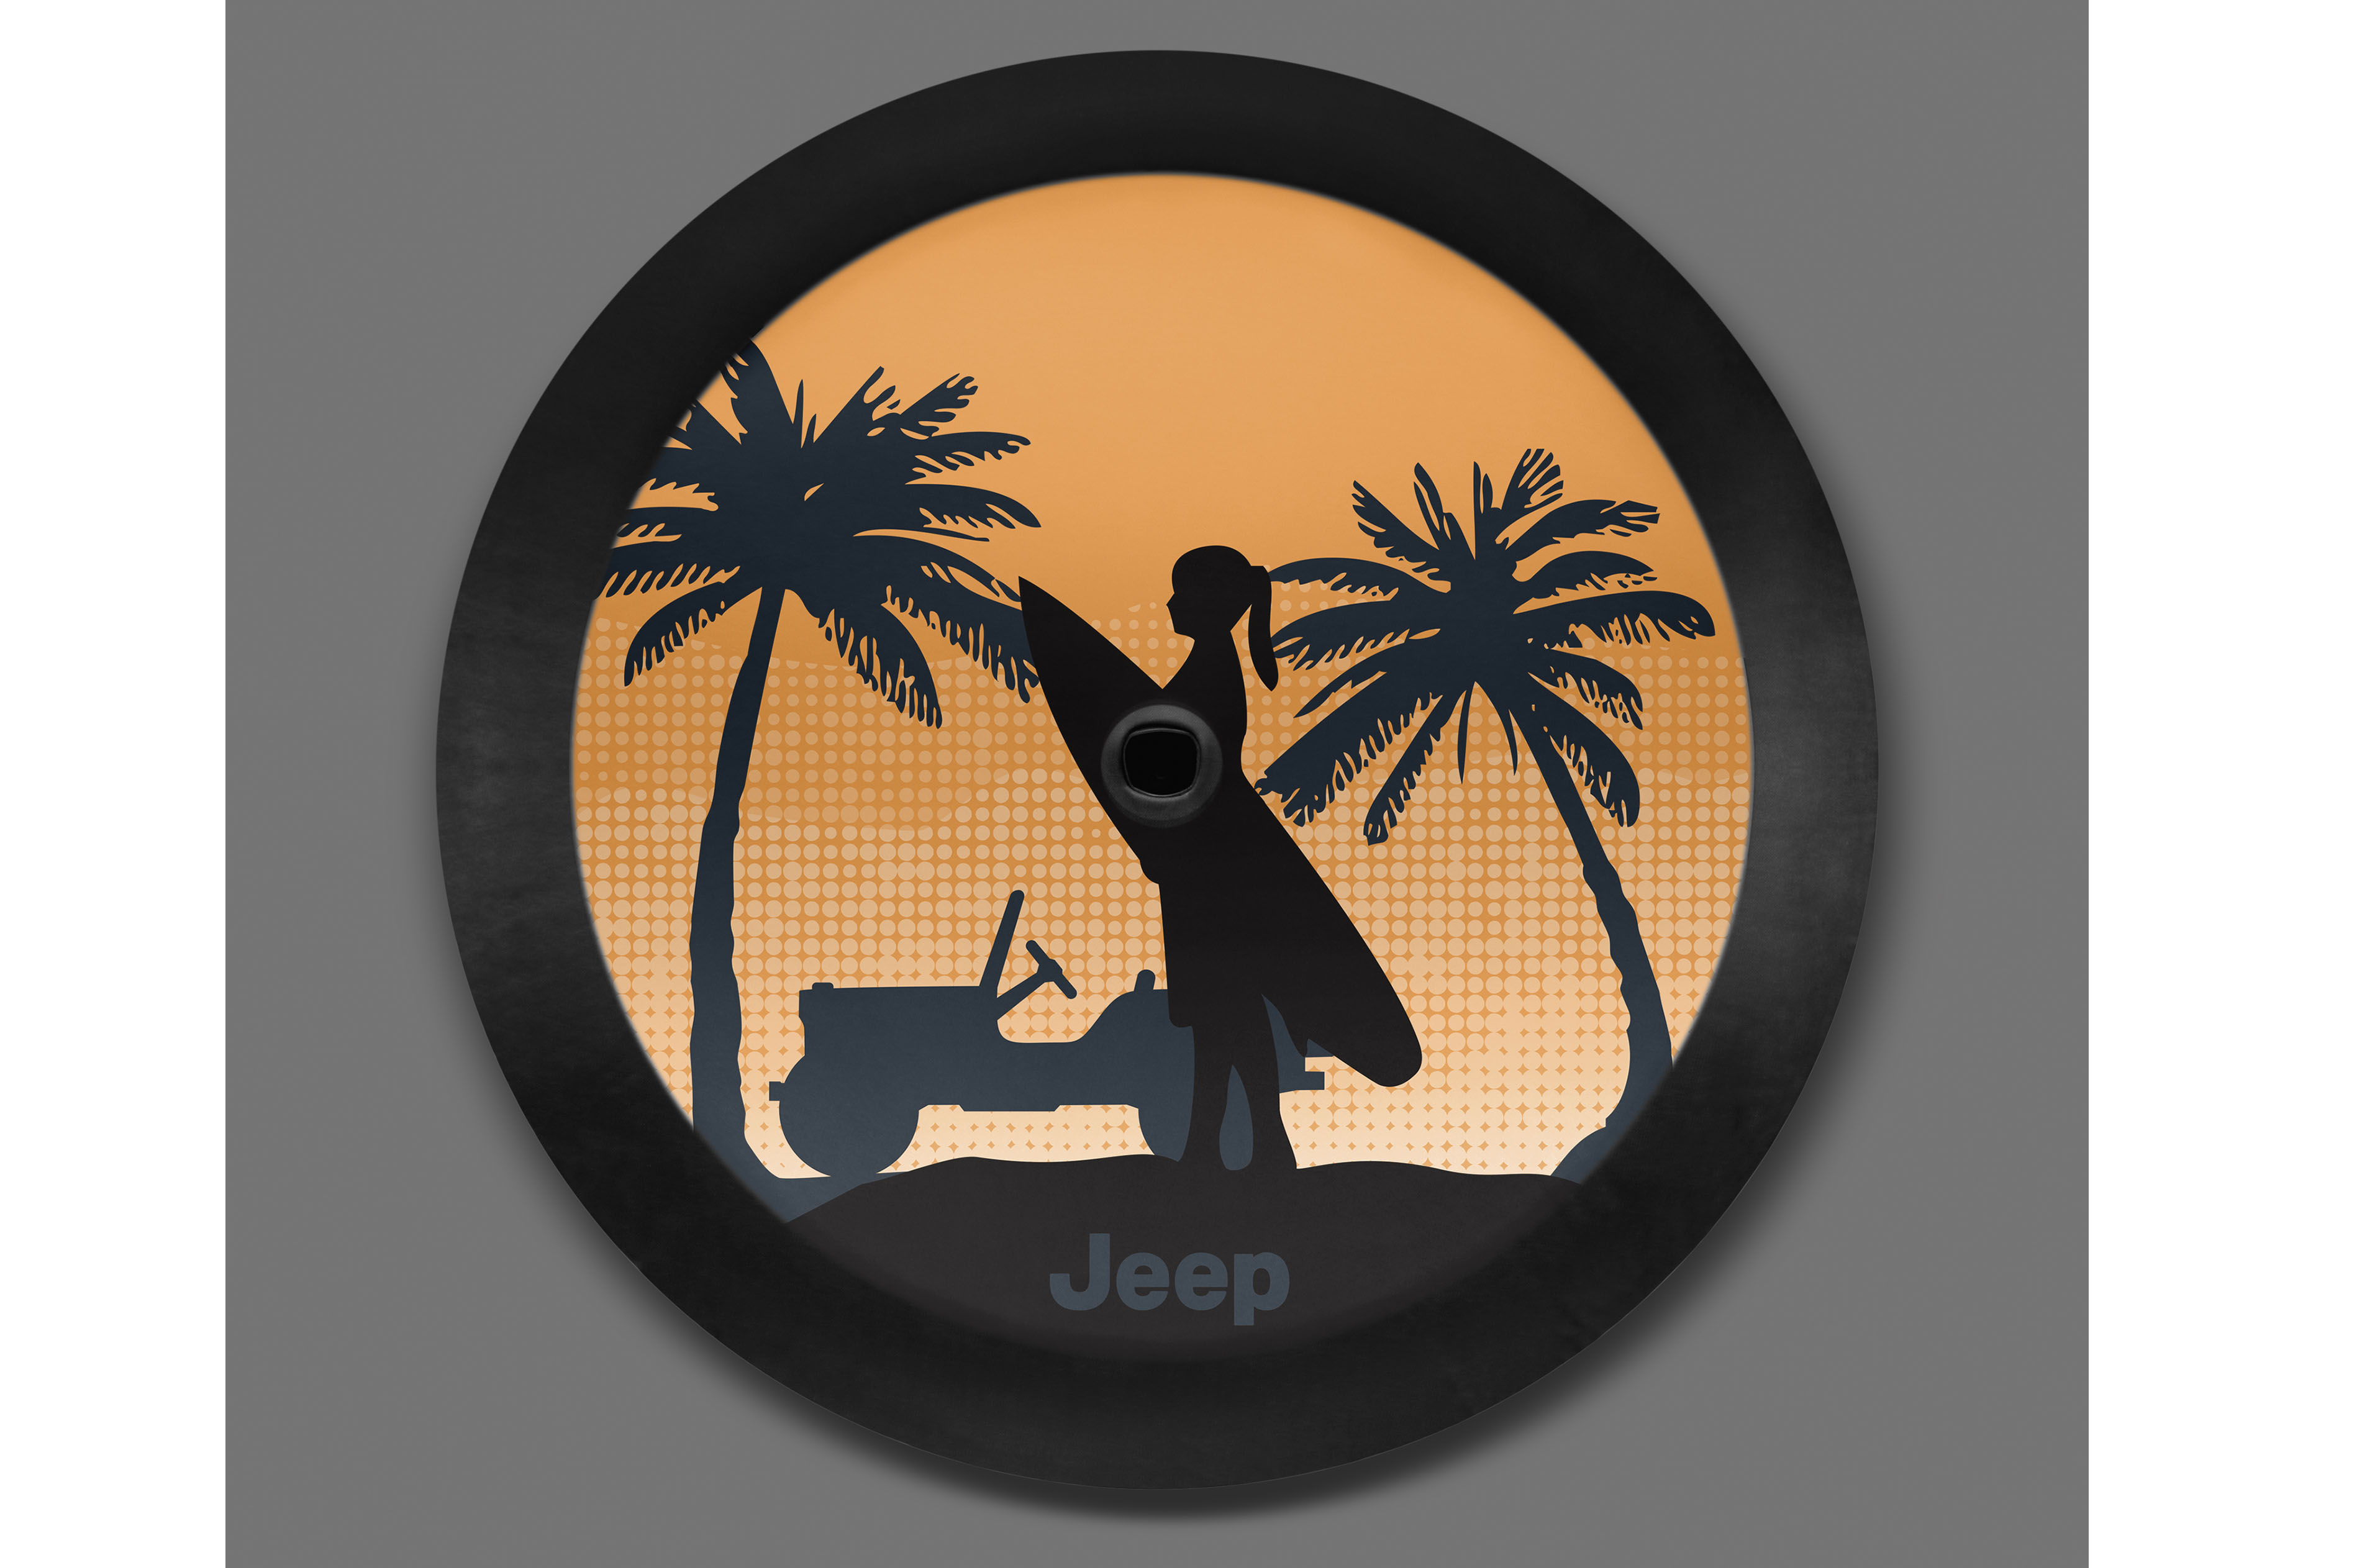 2018 Jeep Wrangler Mopar Moab Silhouette